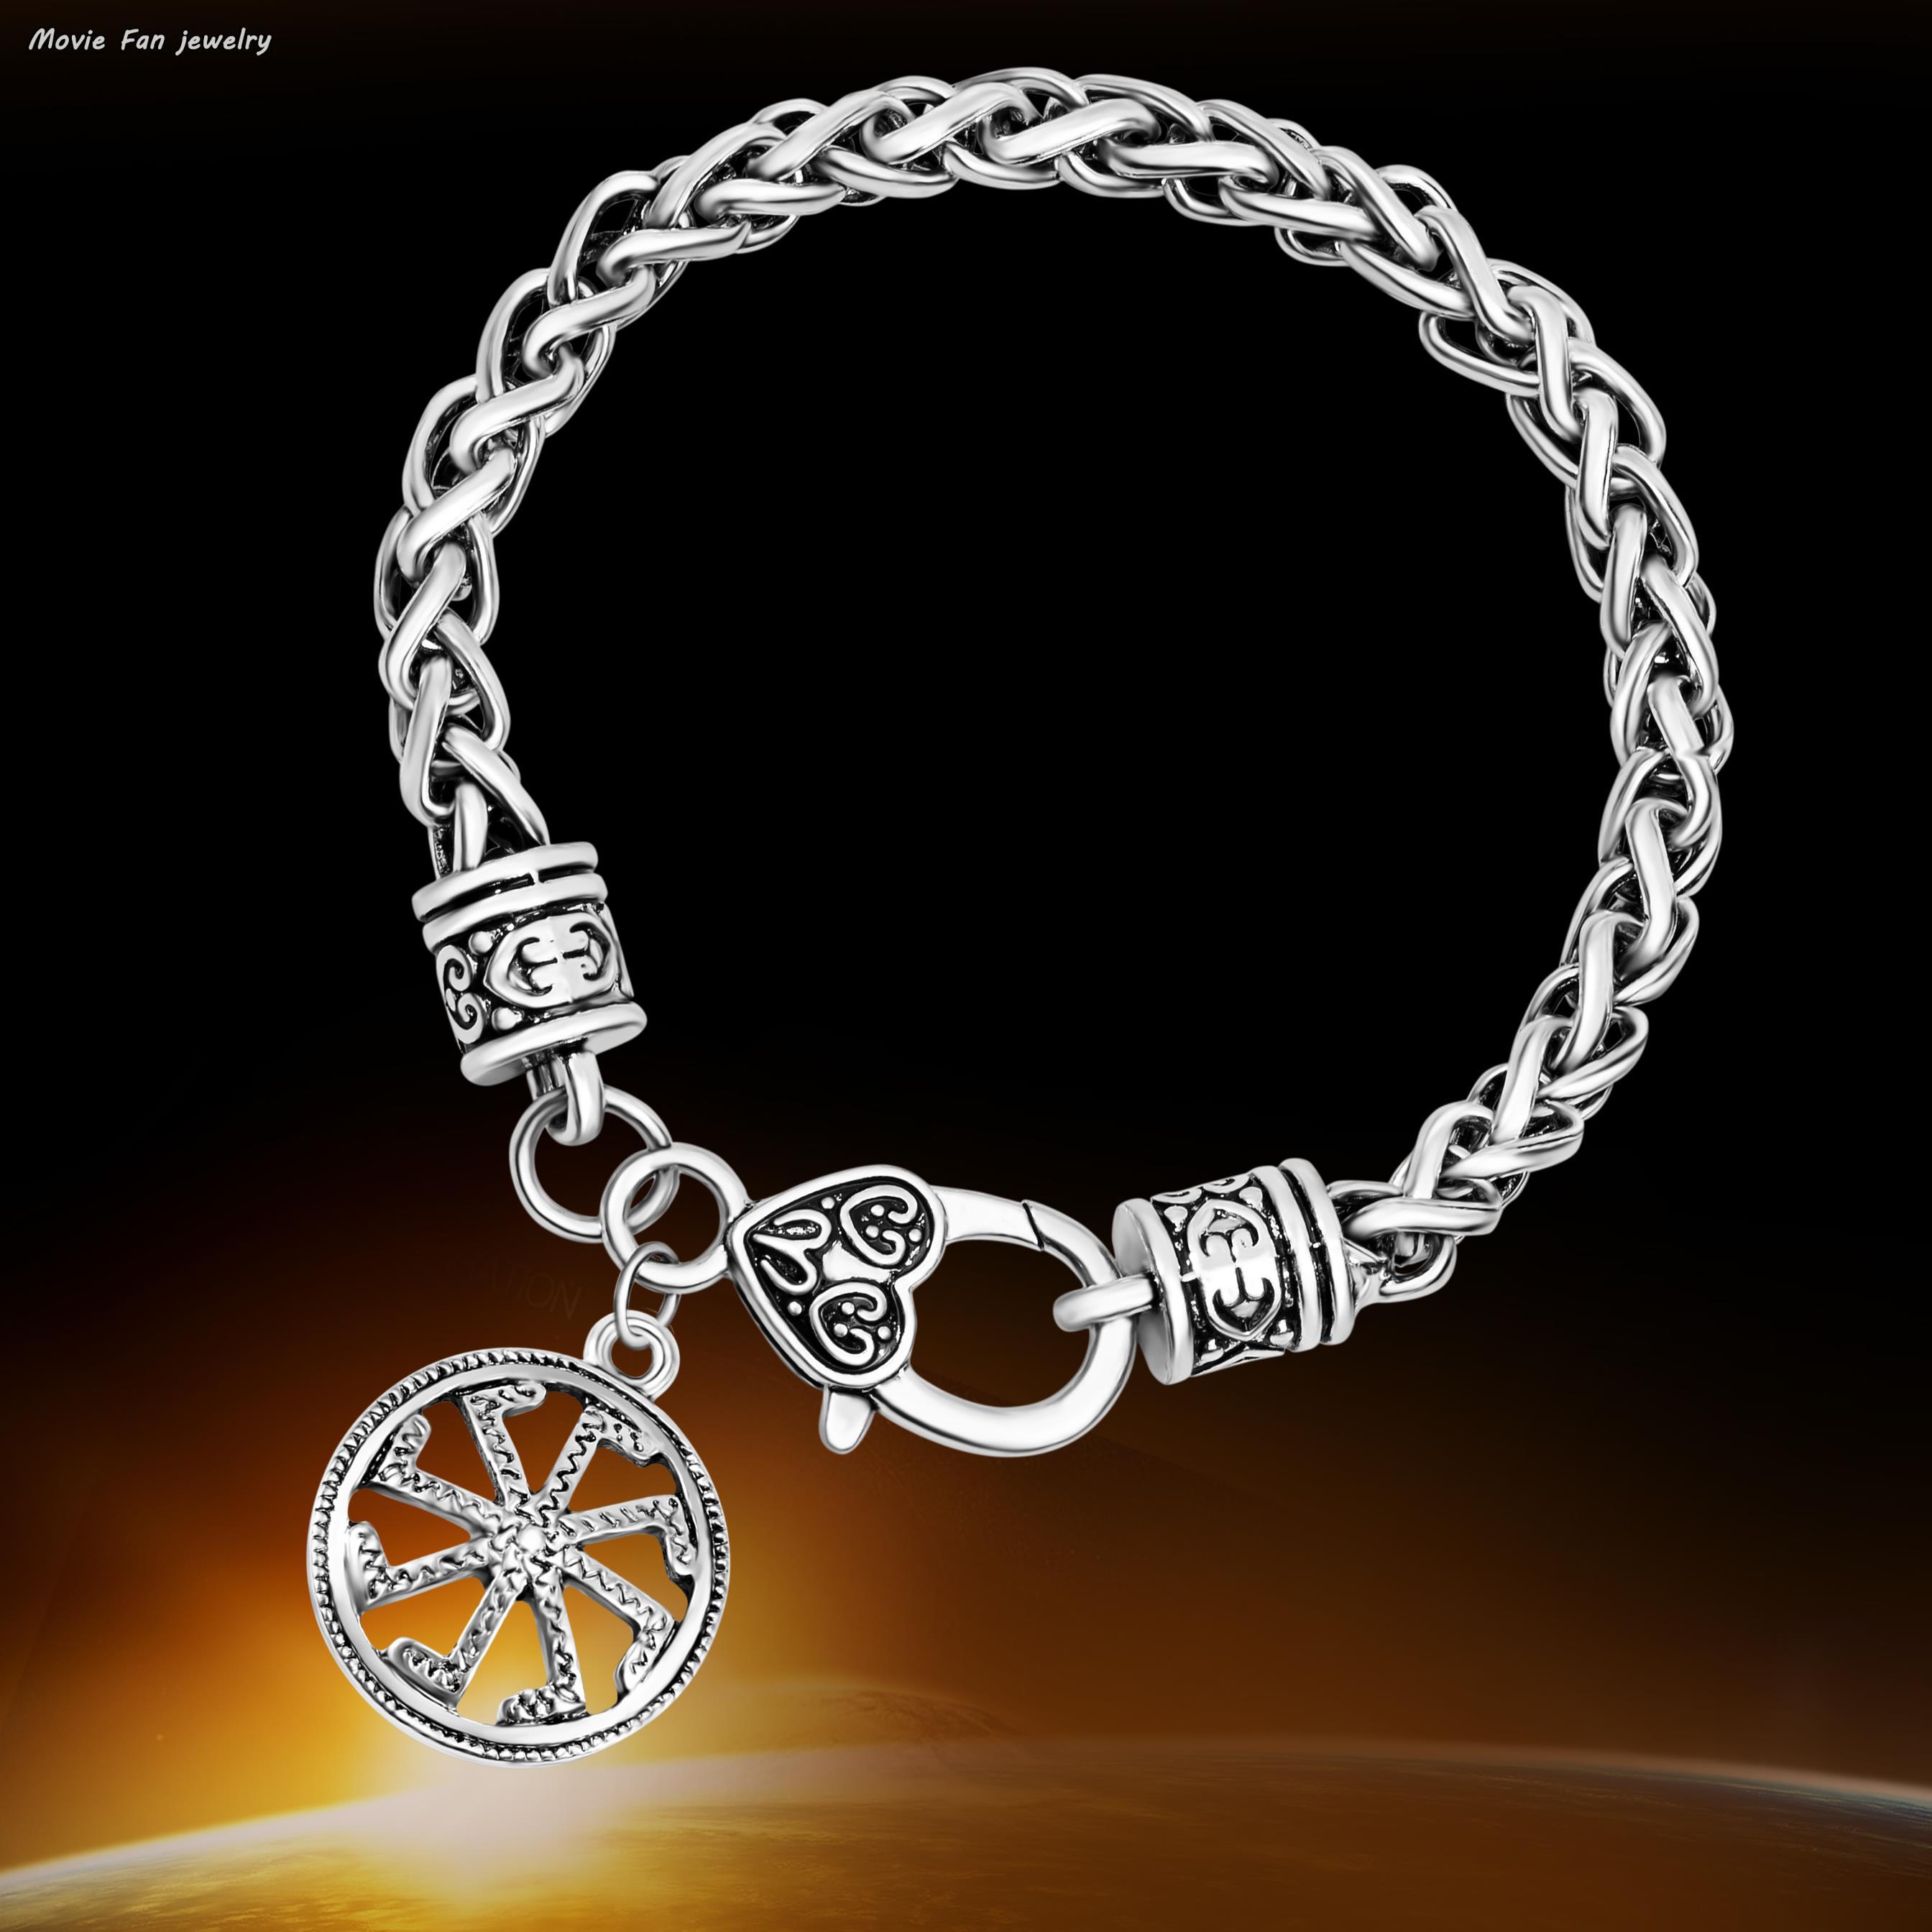 ed3f10df2fa51 US $5.88 |Kolovrat pendant Russian Slavic Sun Talisman Round Power Charm  Bracelets Ethnic Women And Men bulgaria jewelry-in Charm Bracelets from ...